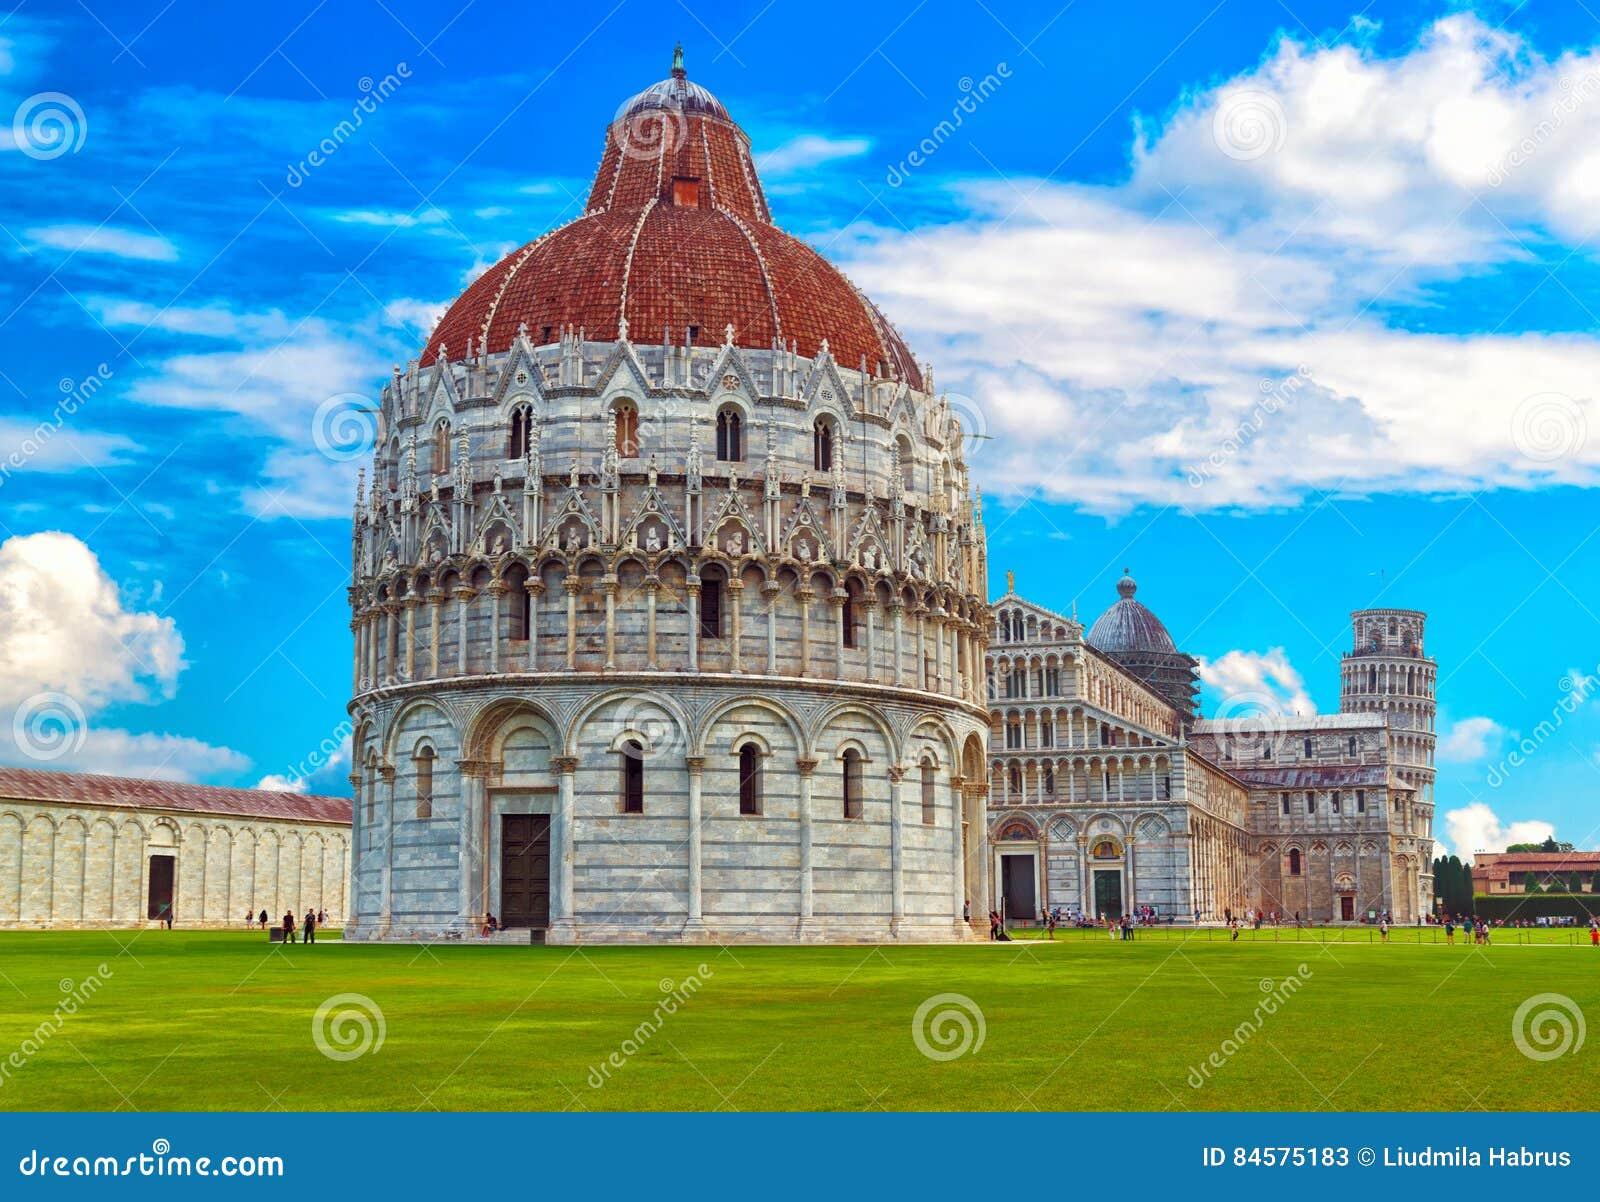 The Pisa Baptistery Of St. John Battistero Di San Giovanni ...